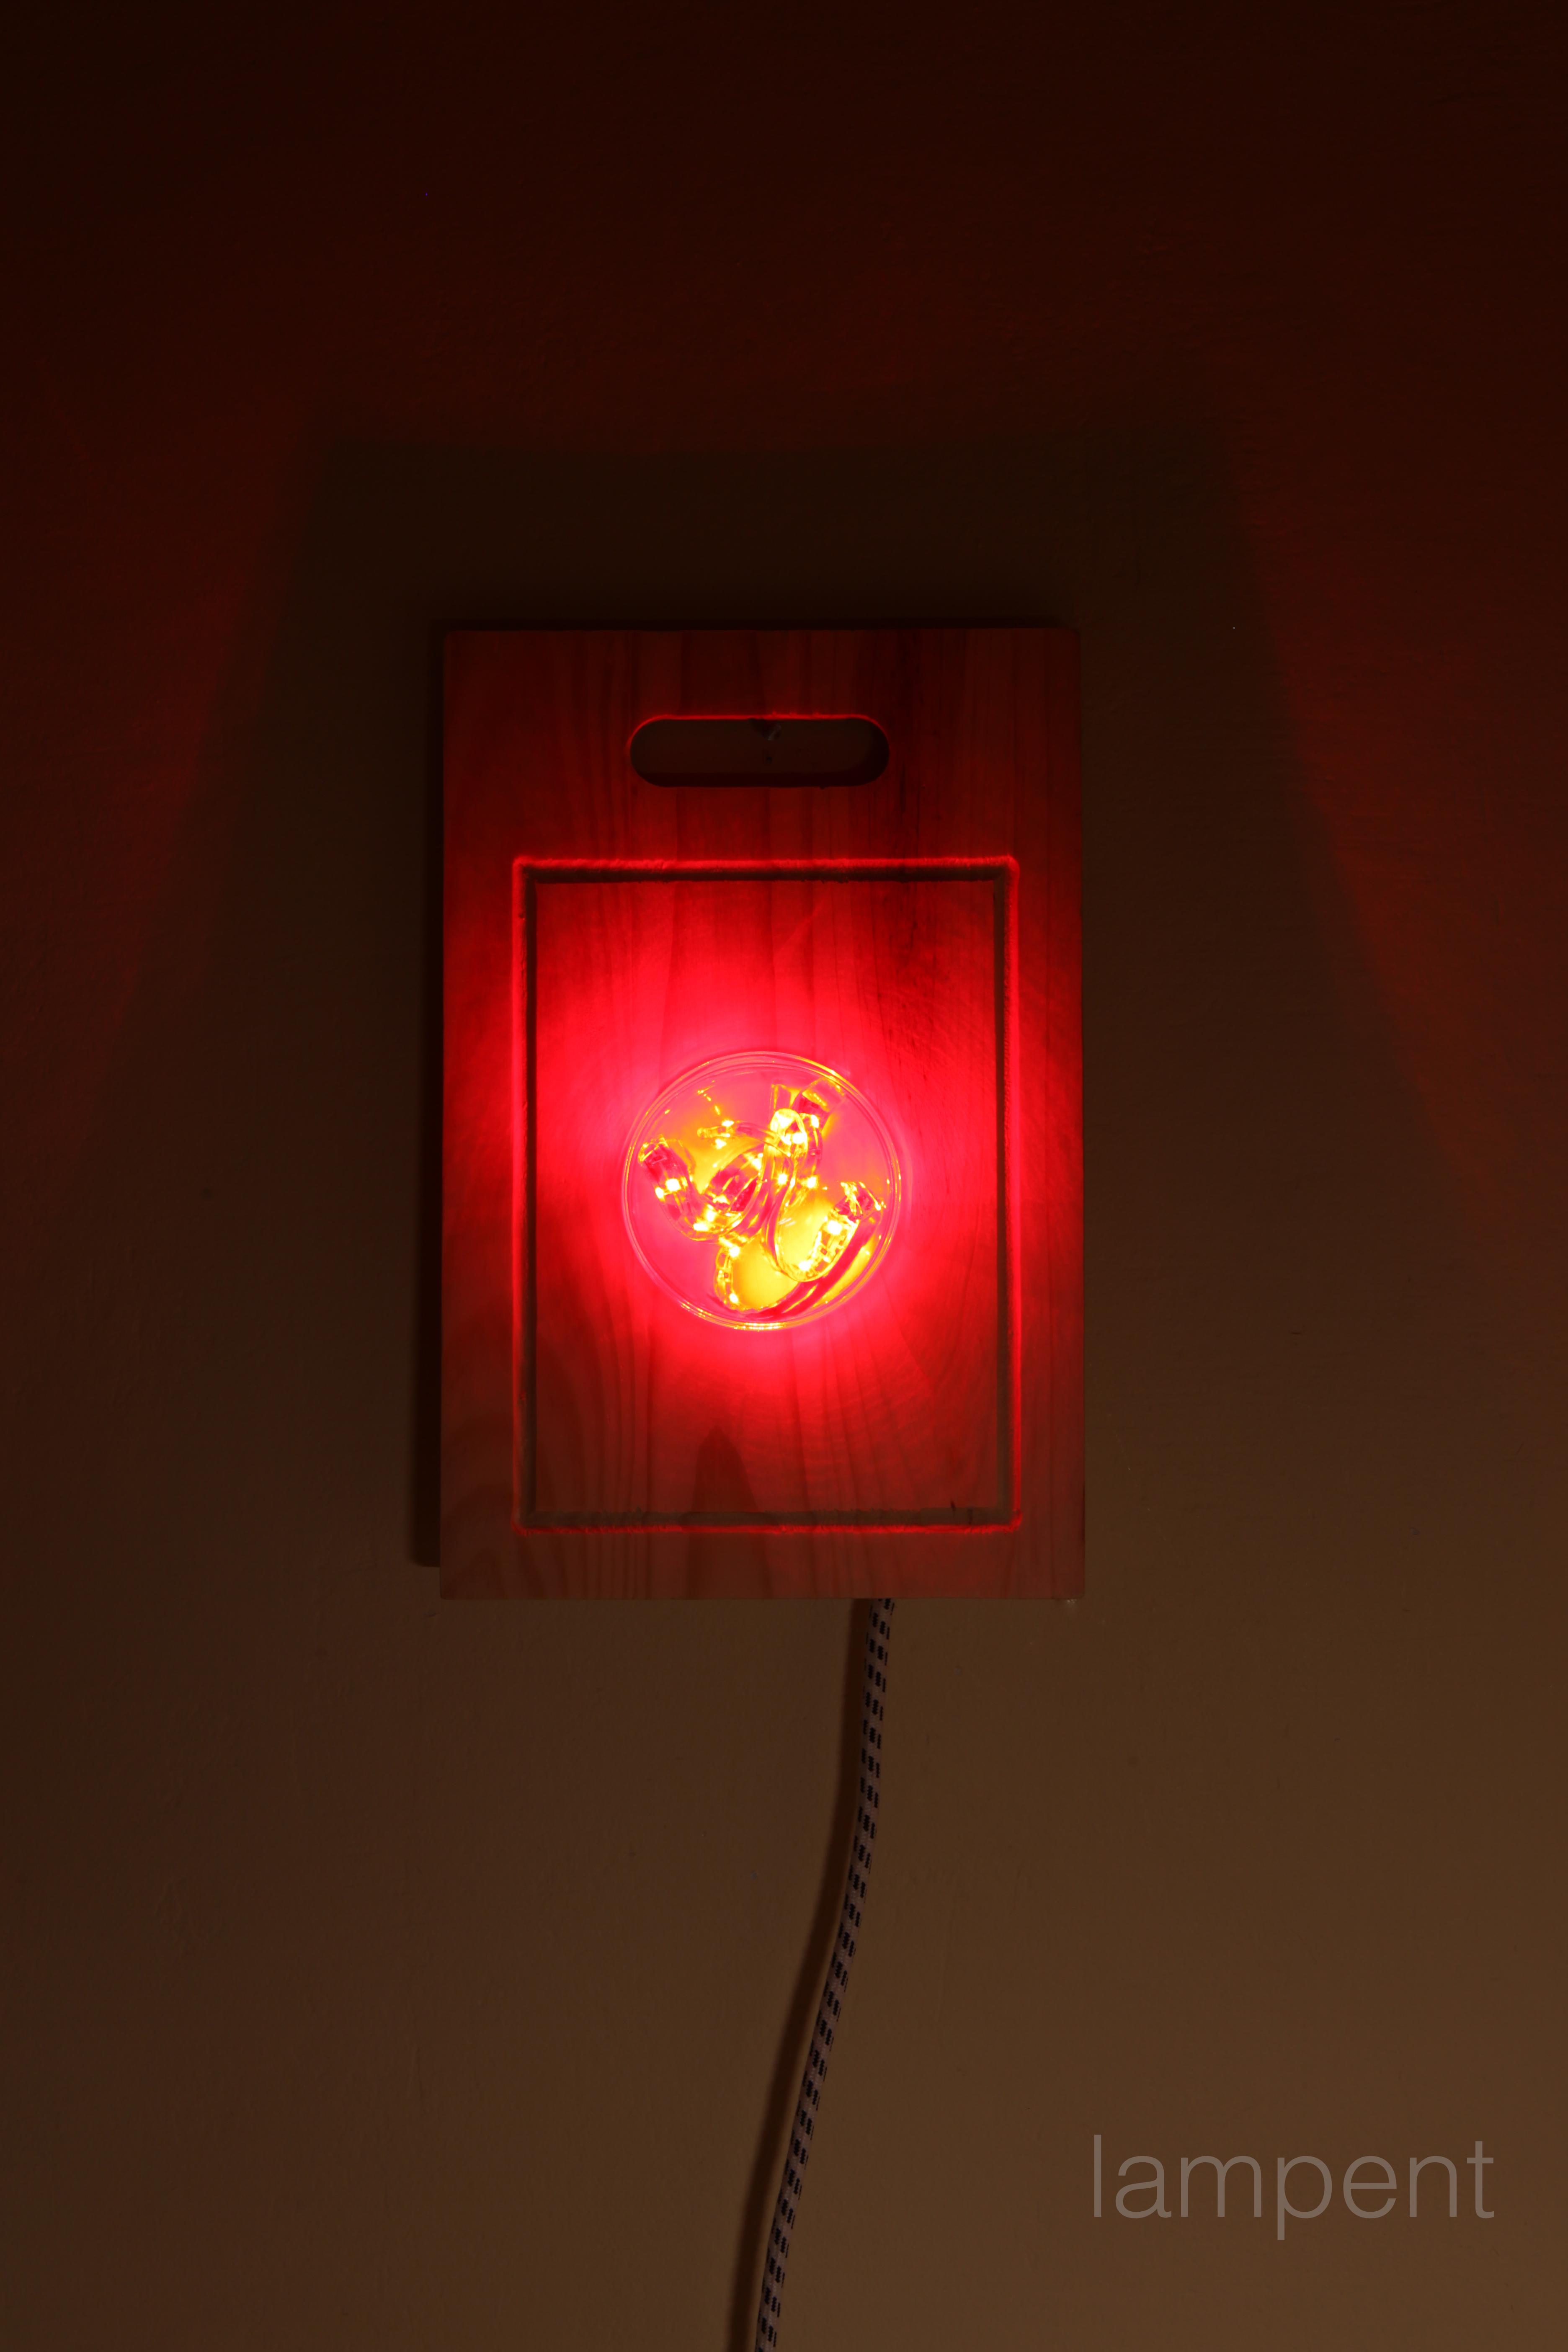 The cutting board led lamp.